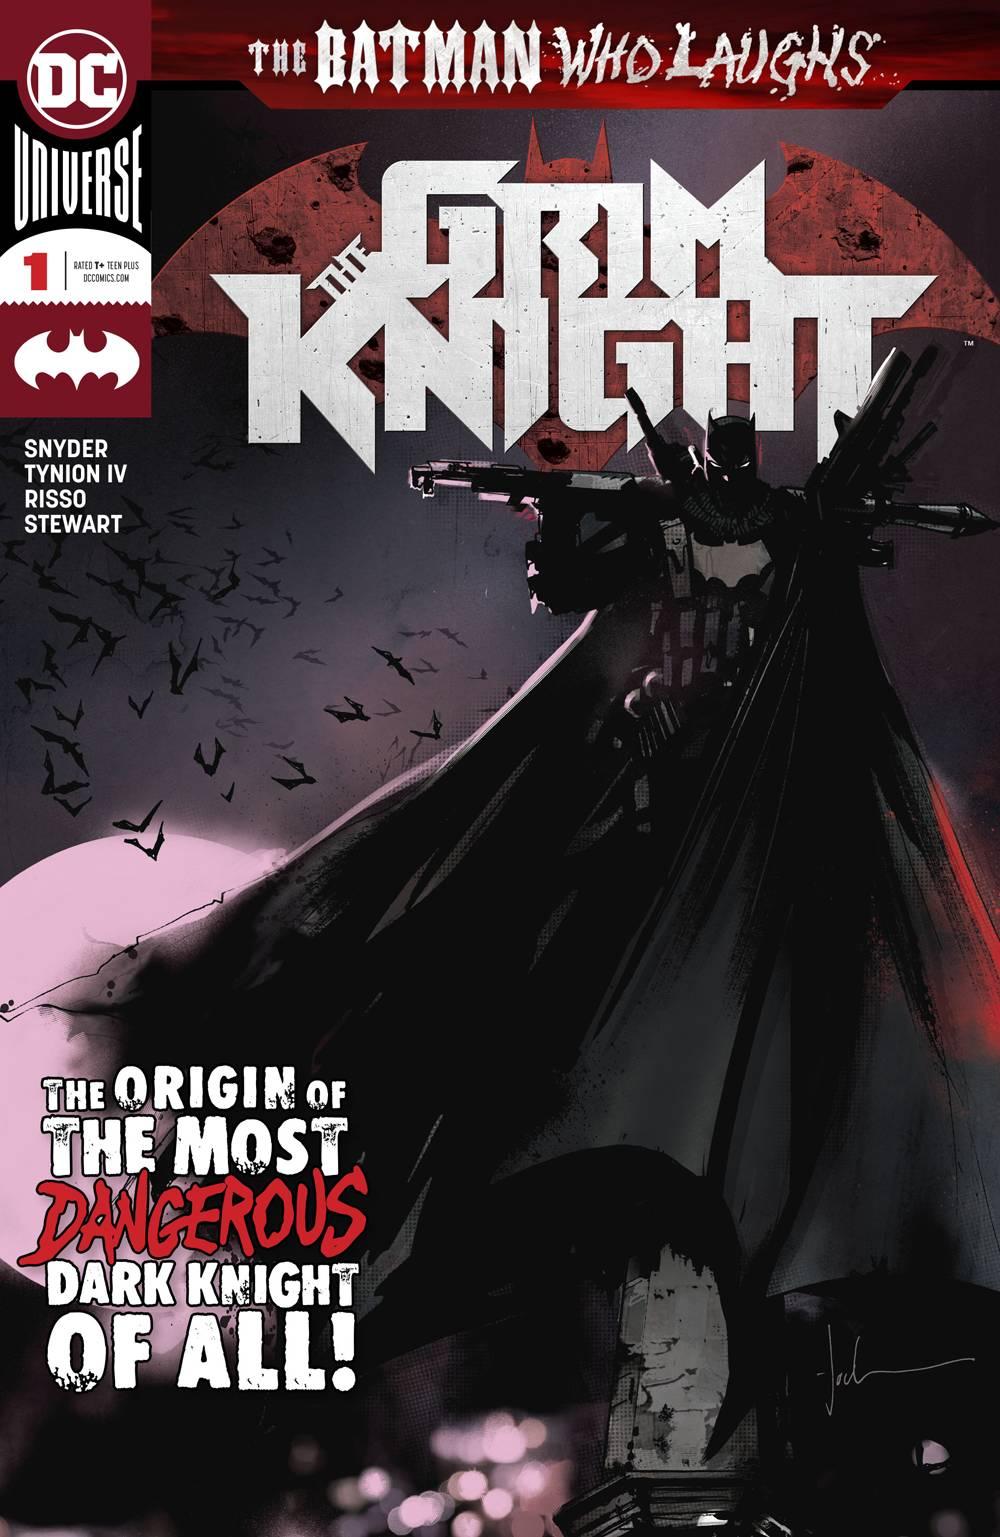 BATMAN+WHO+LAUGHS+THE+GRIM+KNIGHT+1.jpg.jpeg